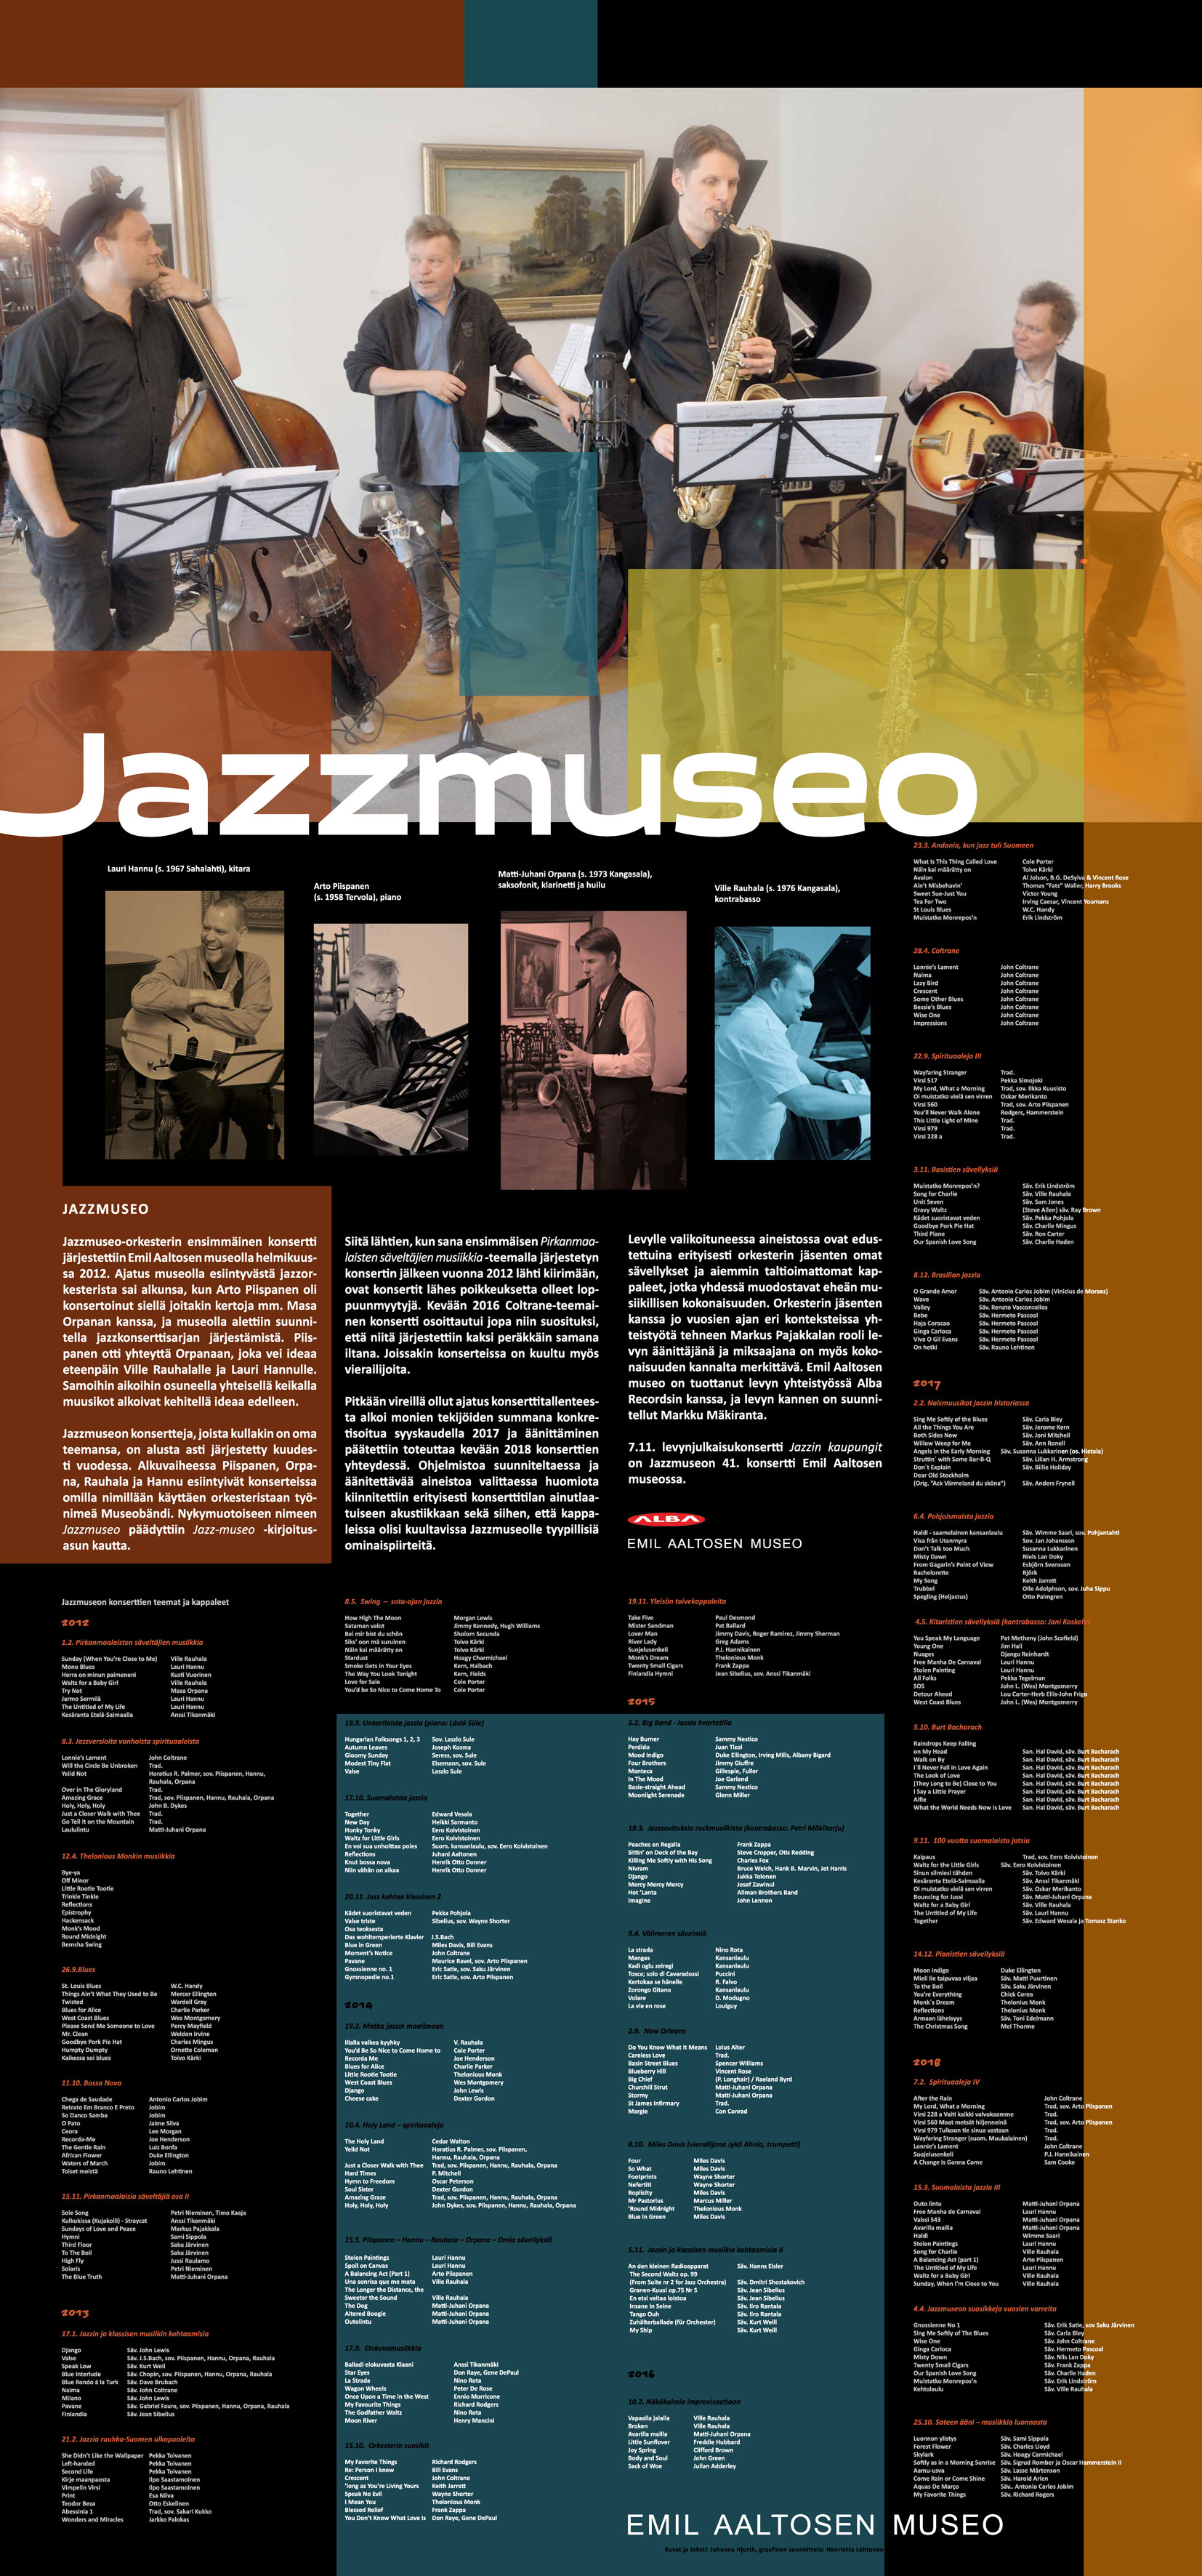 jazzmuseo